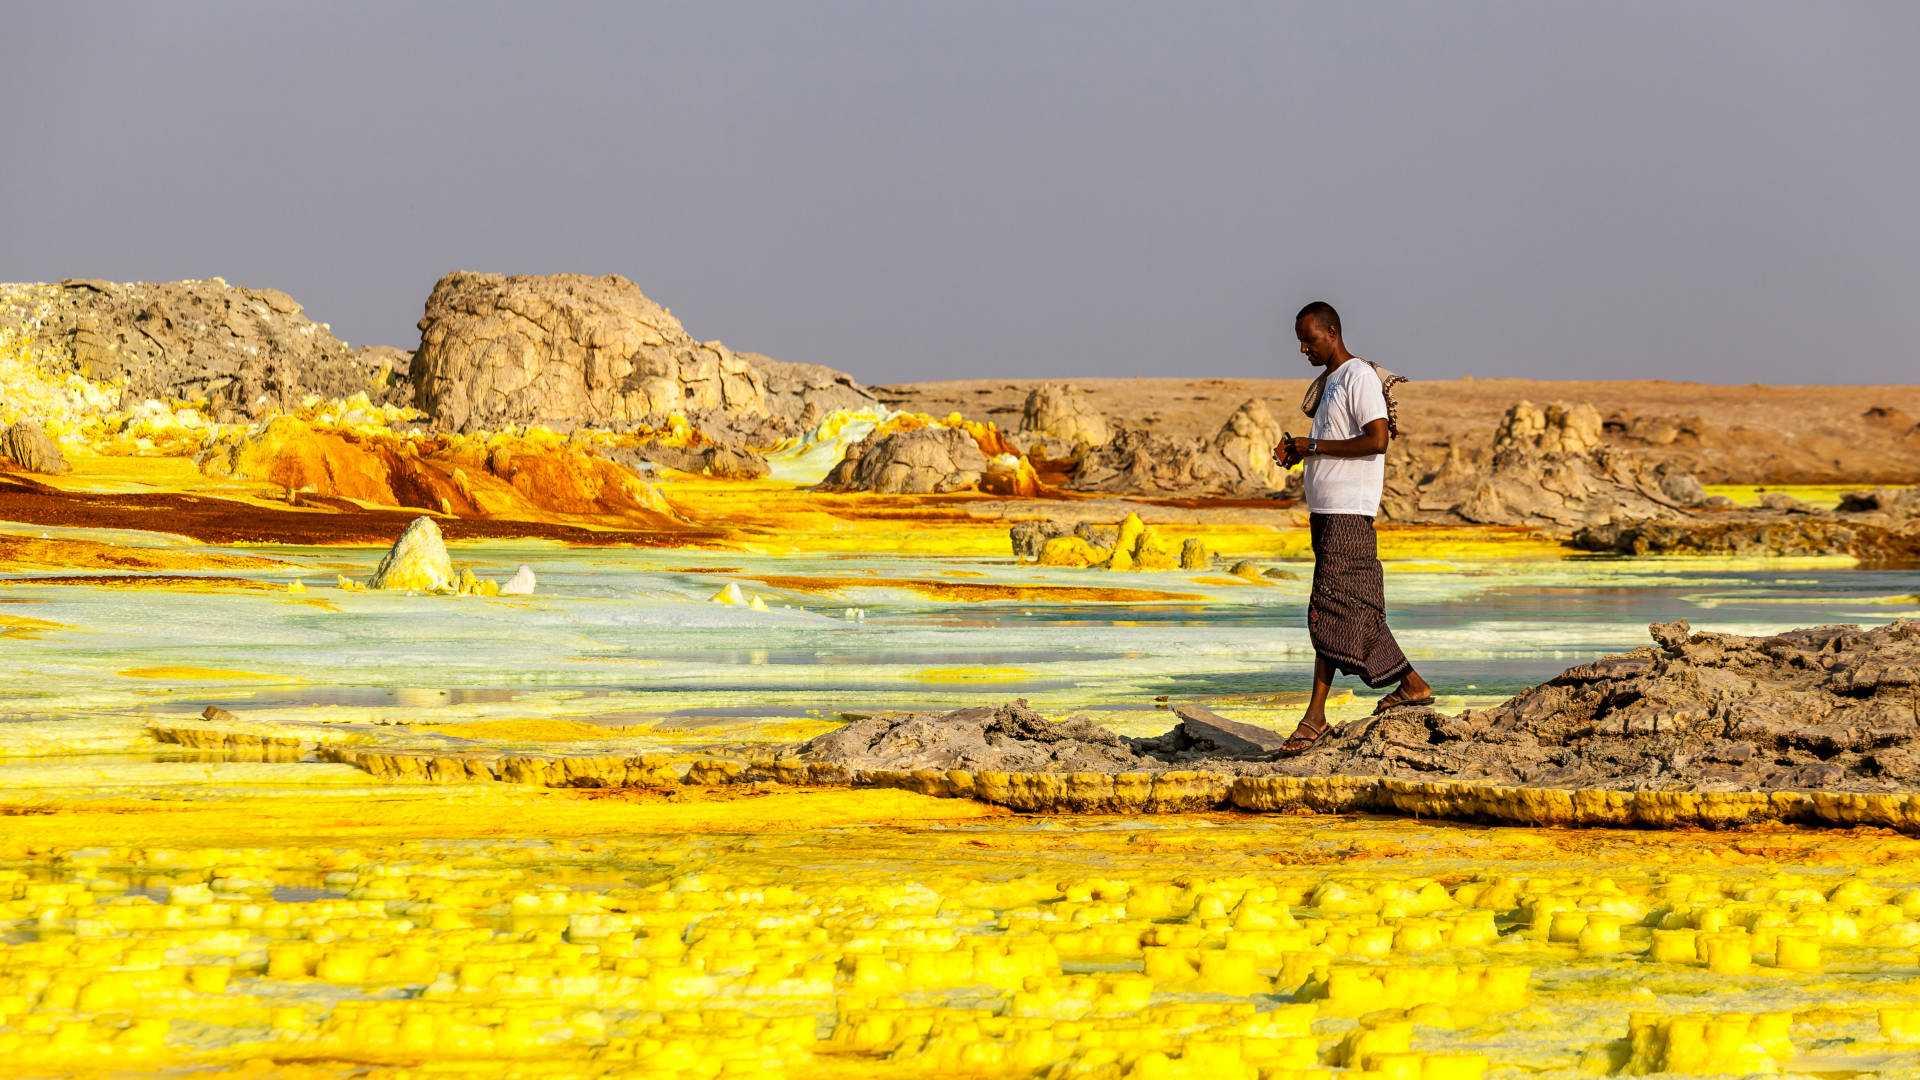 Custom-Travel-Planner-Network-Ethiopia-Volcano-Dallol